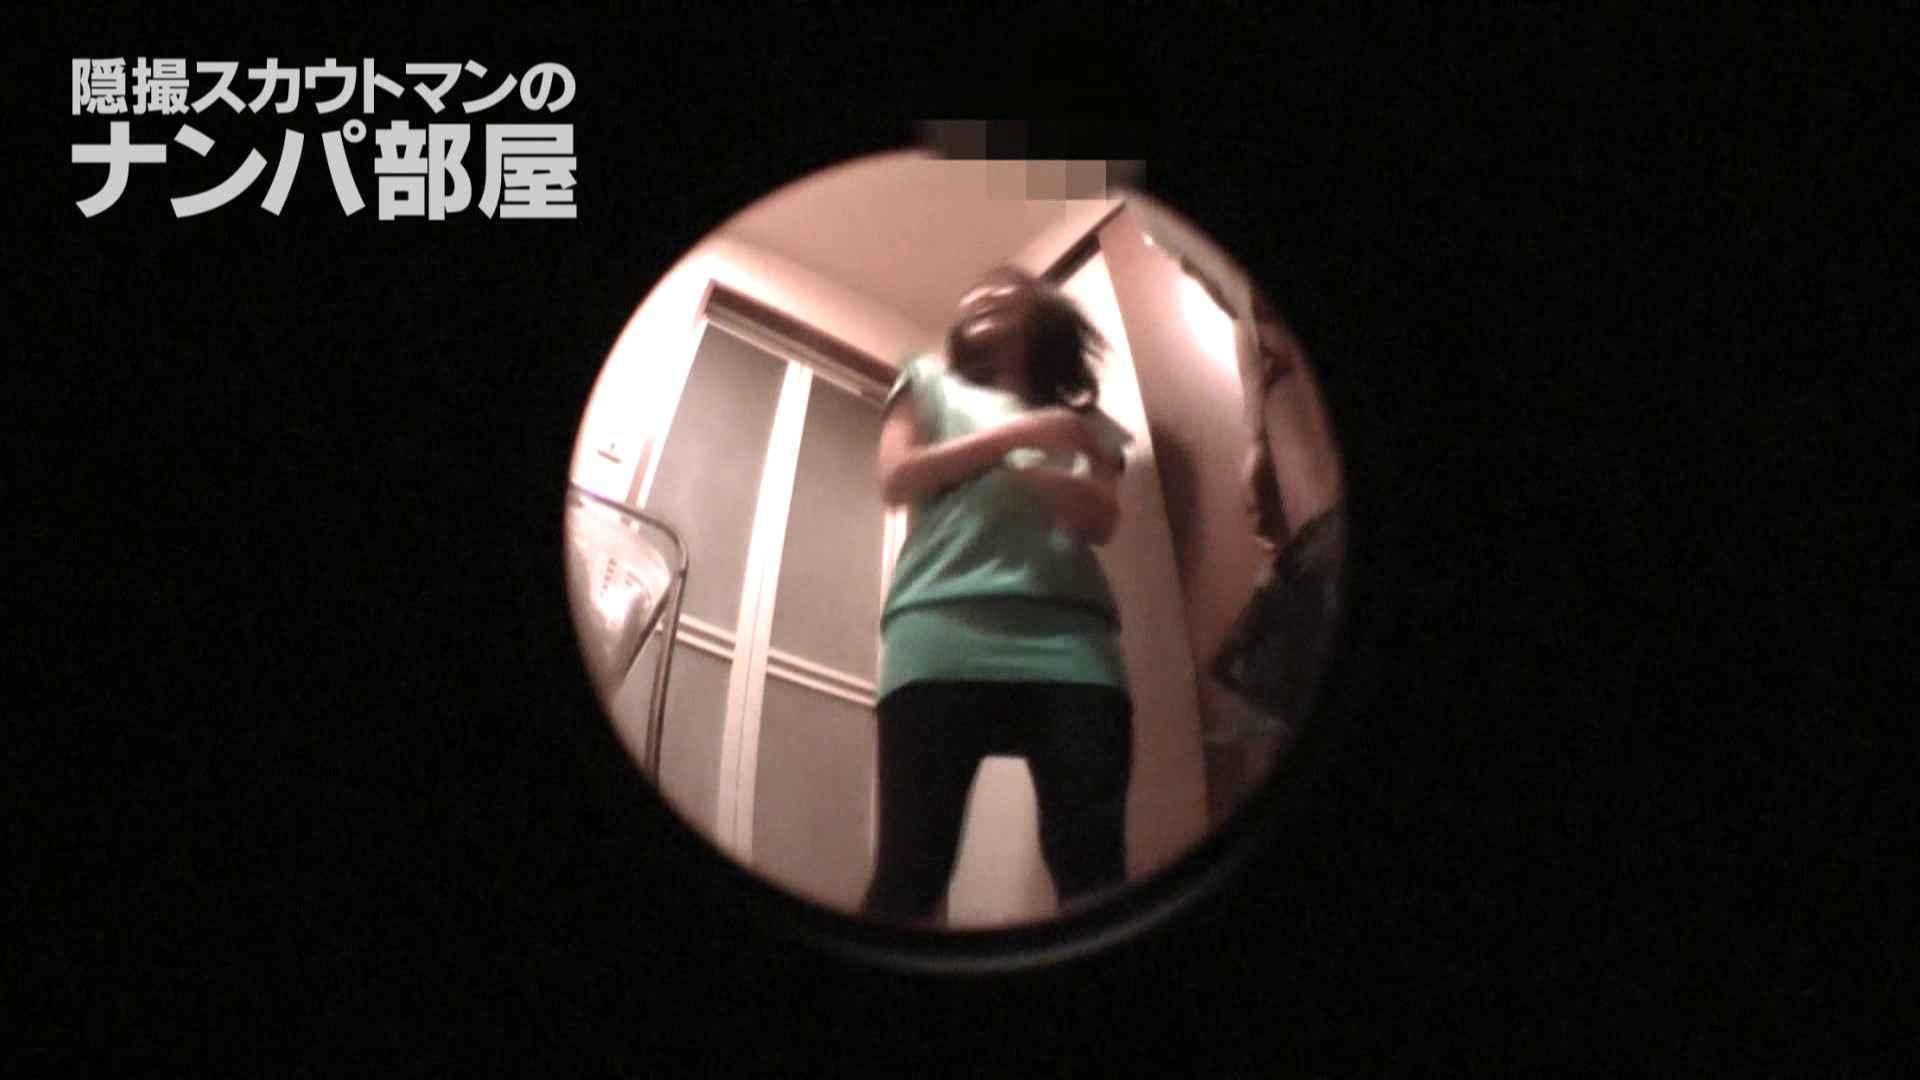 sii 脱衣所   フェラ動画  49画像 21